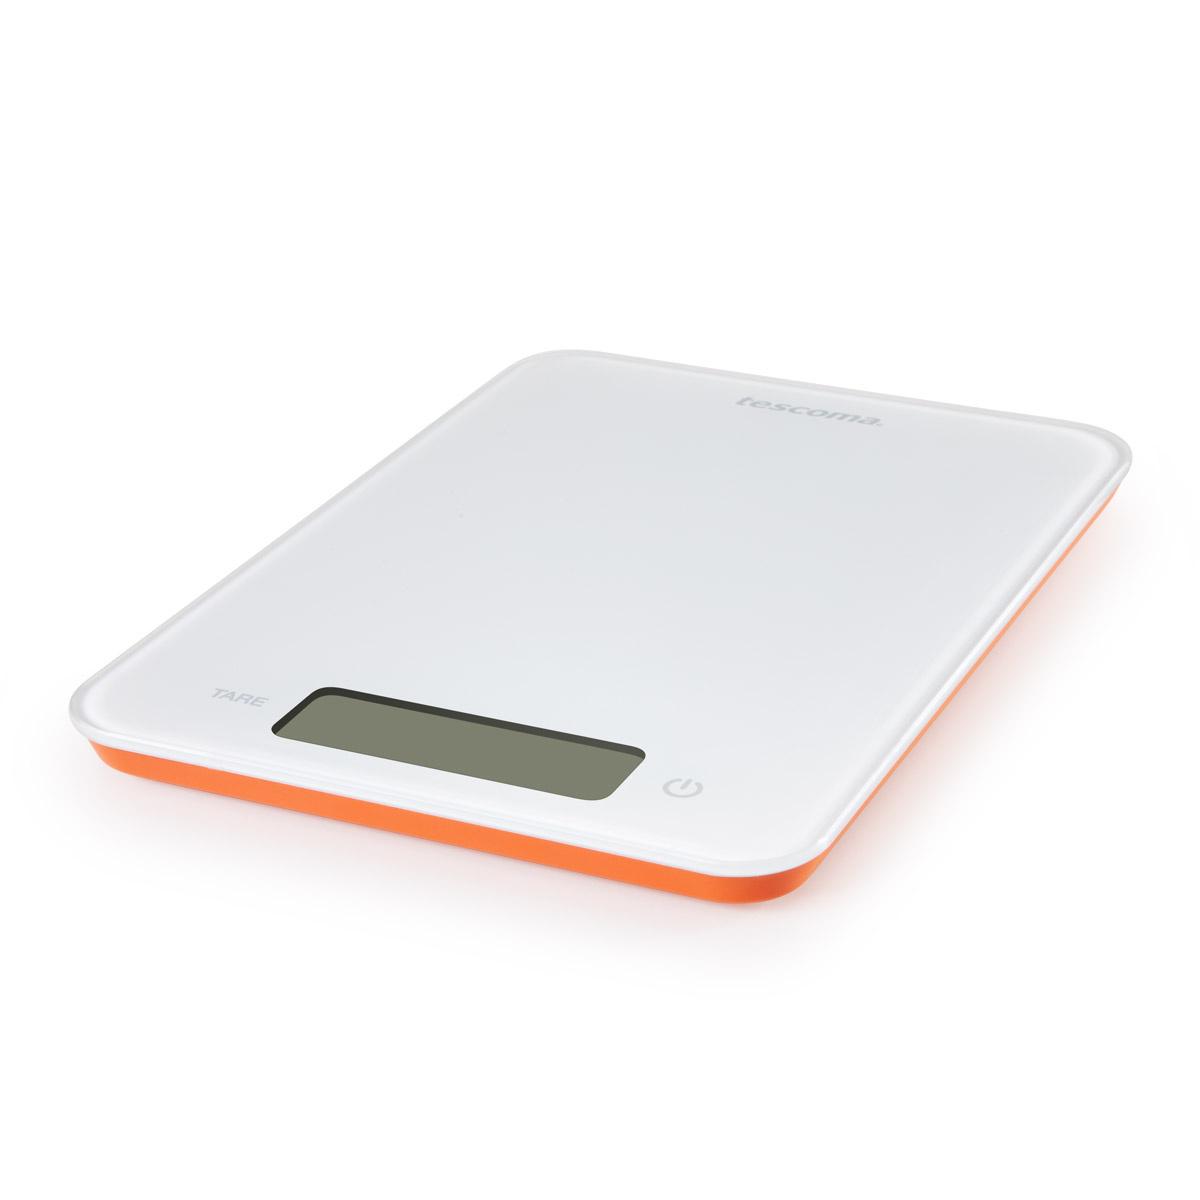 Tescoma Digitálna kuchynská váha ACCURA, 15 kg